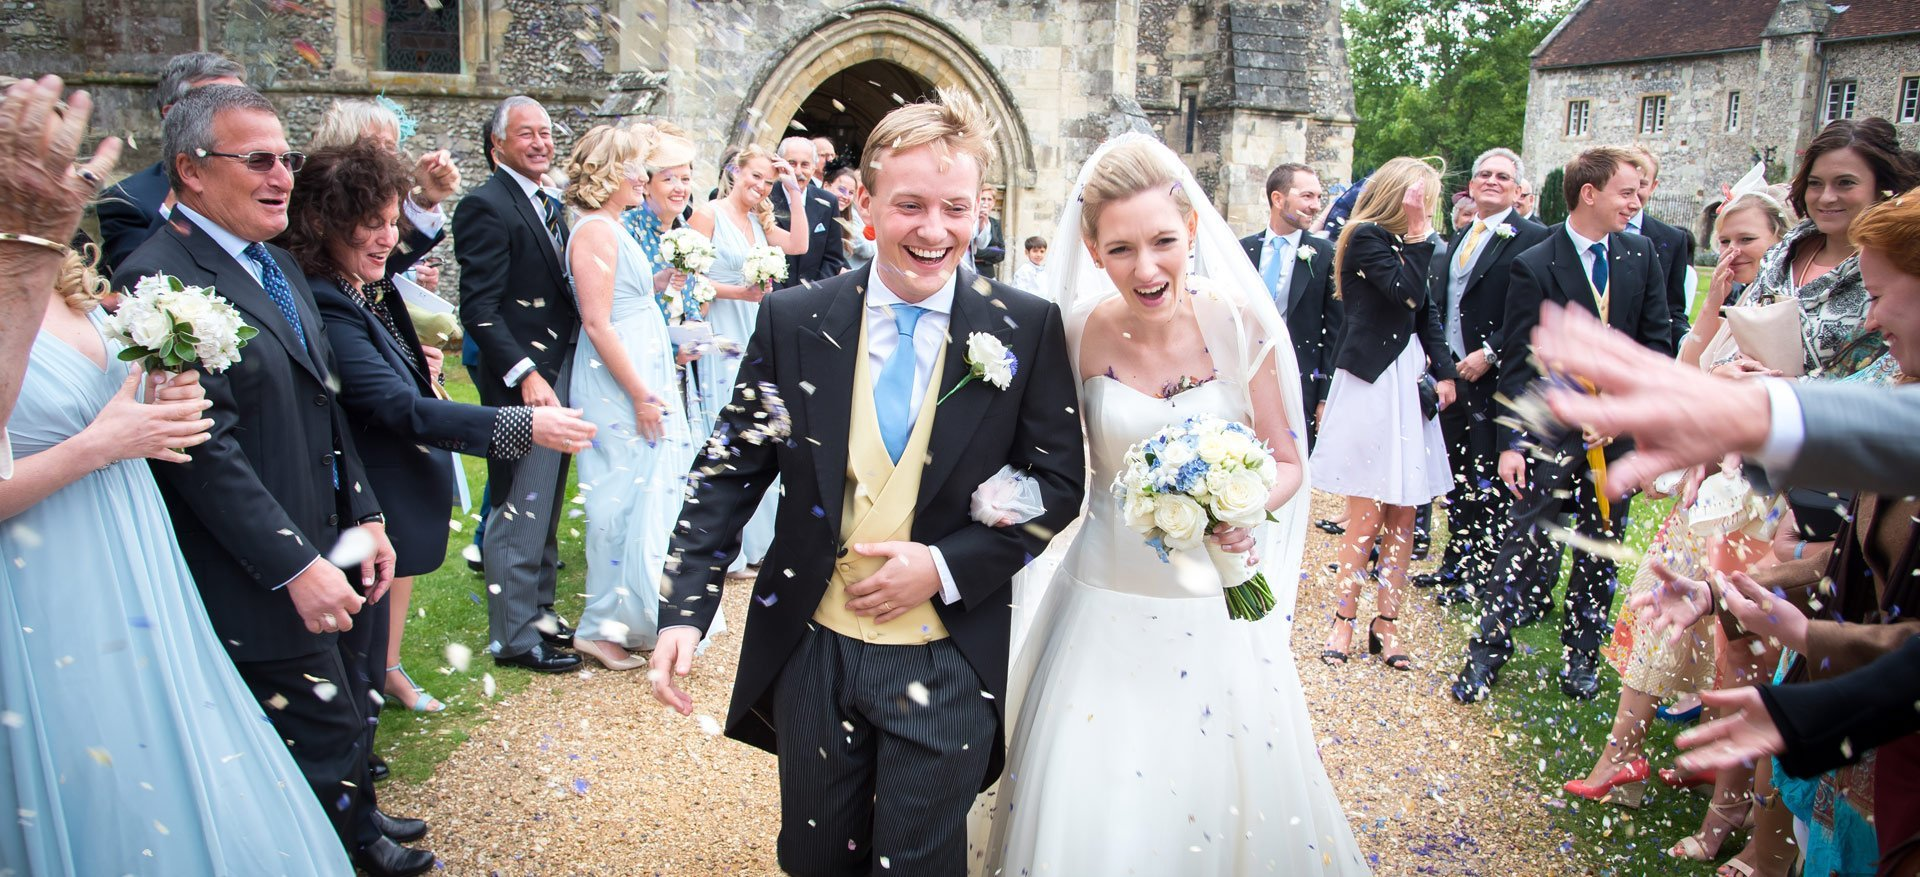 Wedding photography Winchester,Hampshire - ASRPHOTO